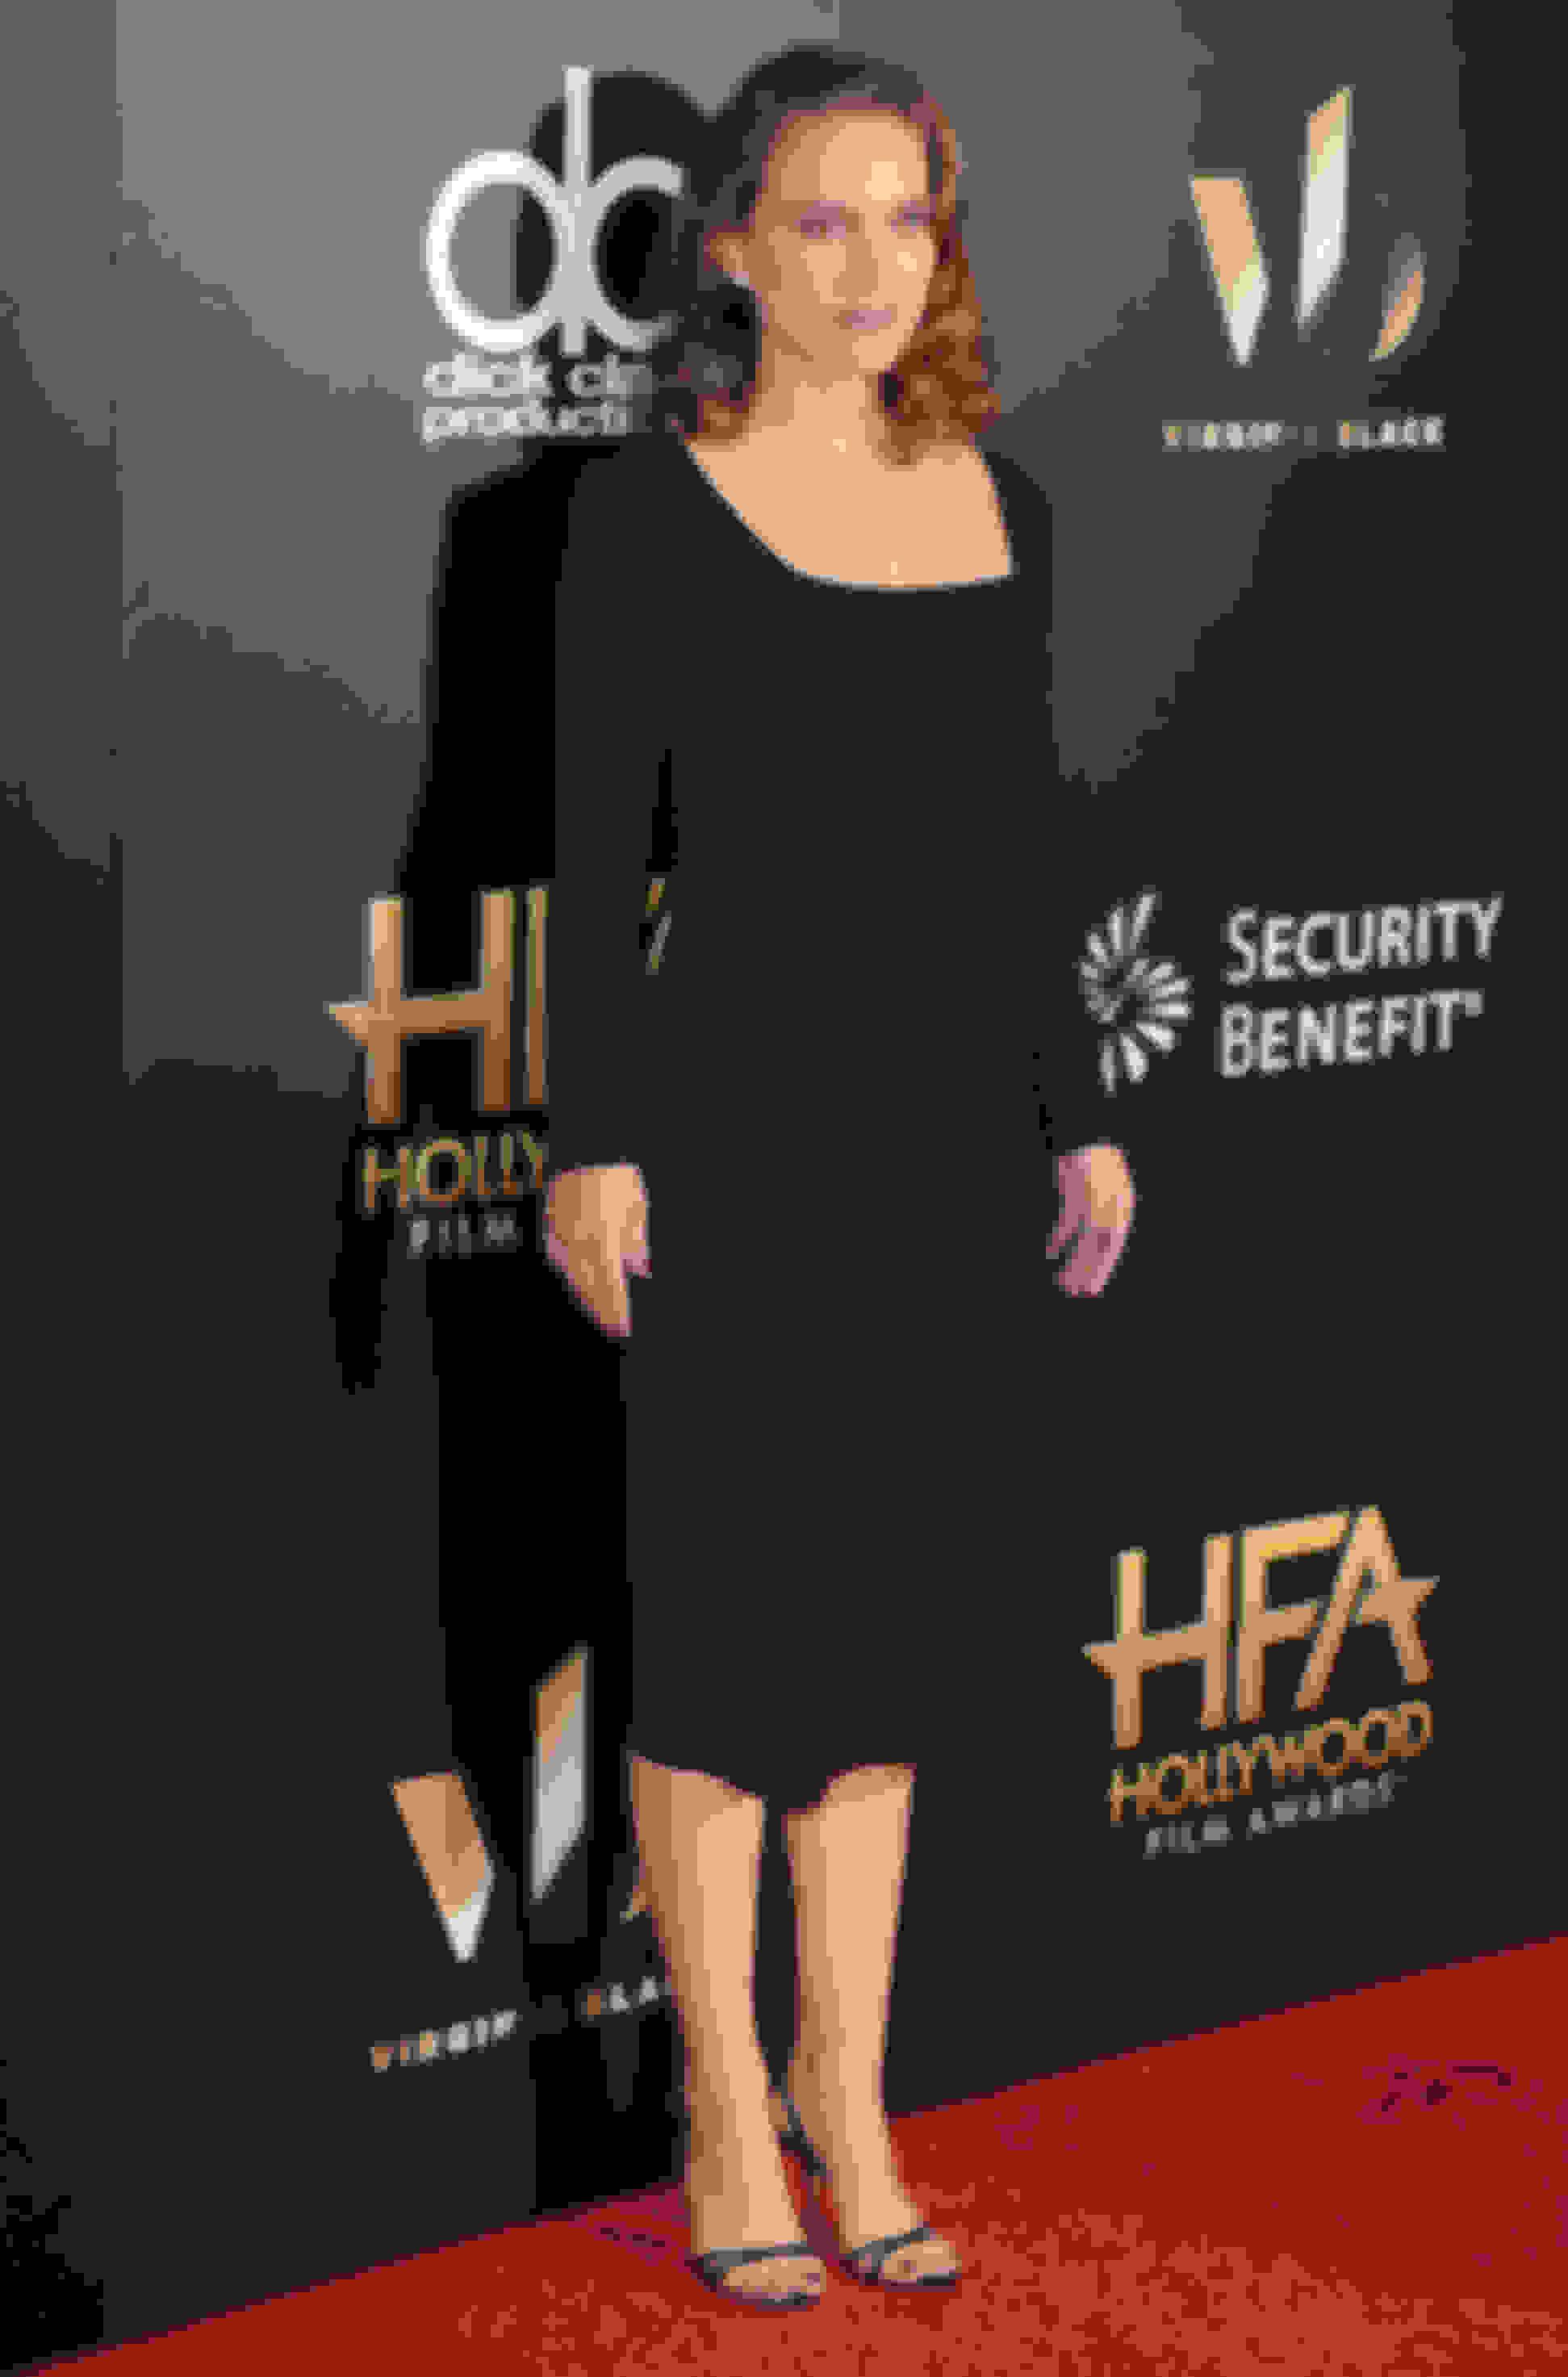 Natalie Portman wearing JASMINE